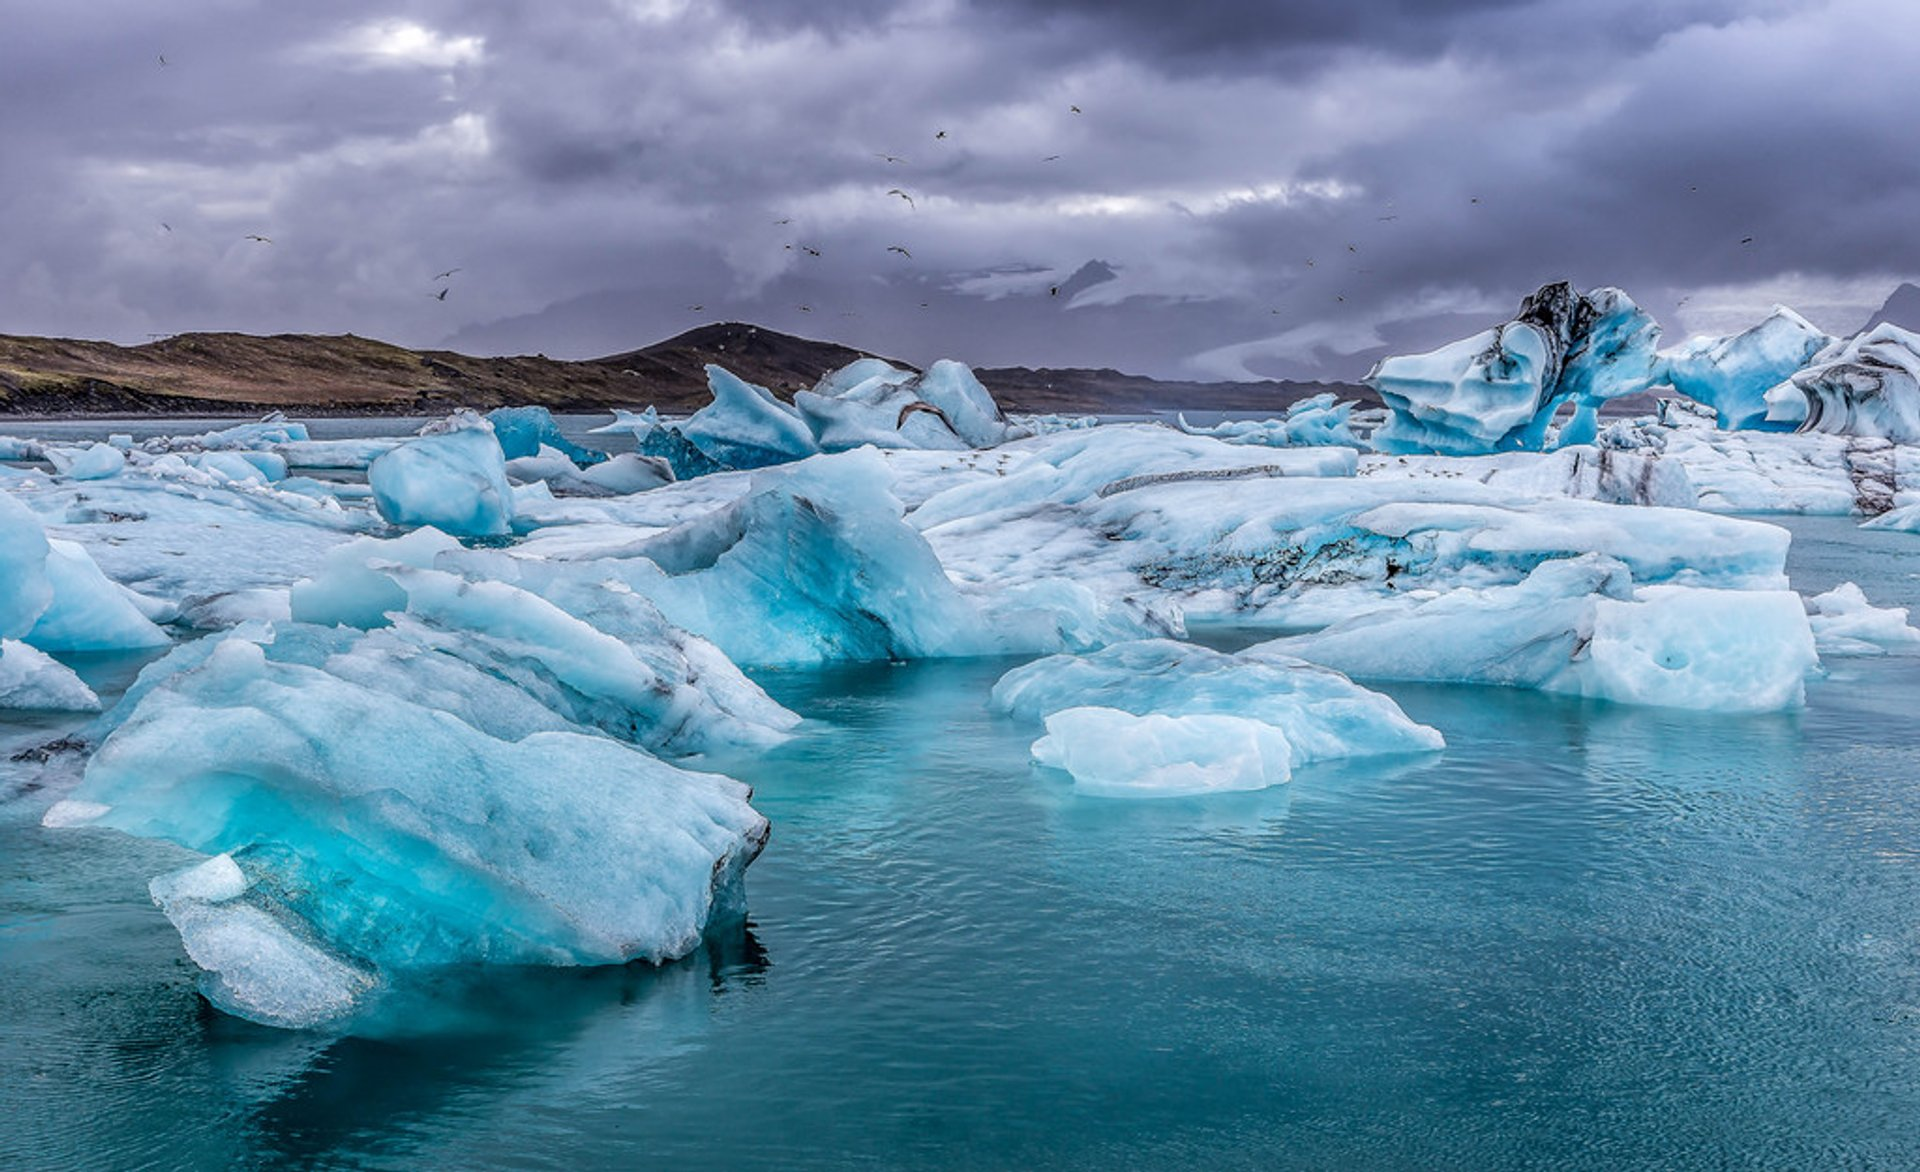 Best time for Jökulsárlón Glacier Lagoon in Iceland 2020